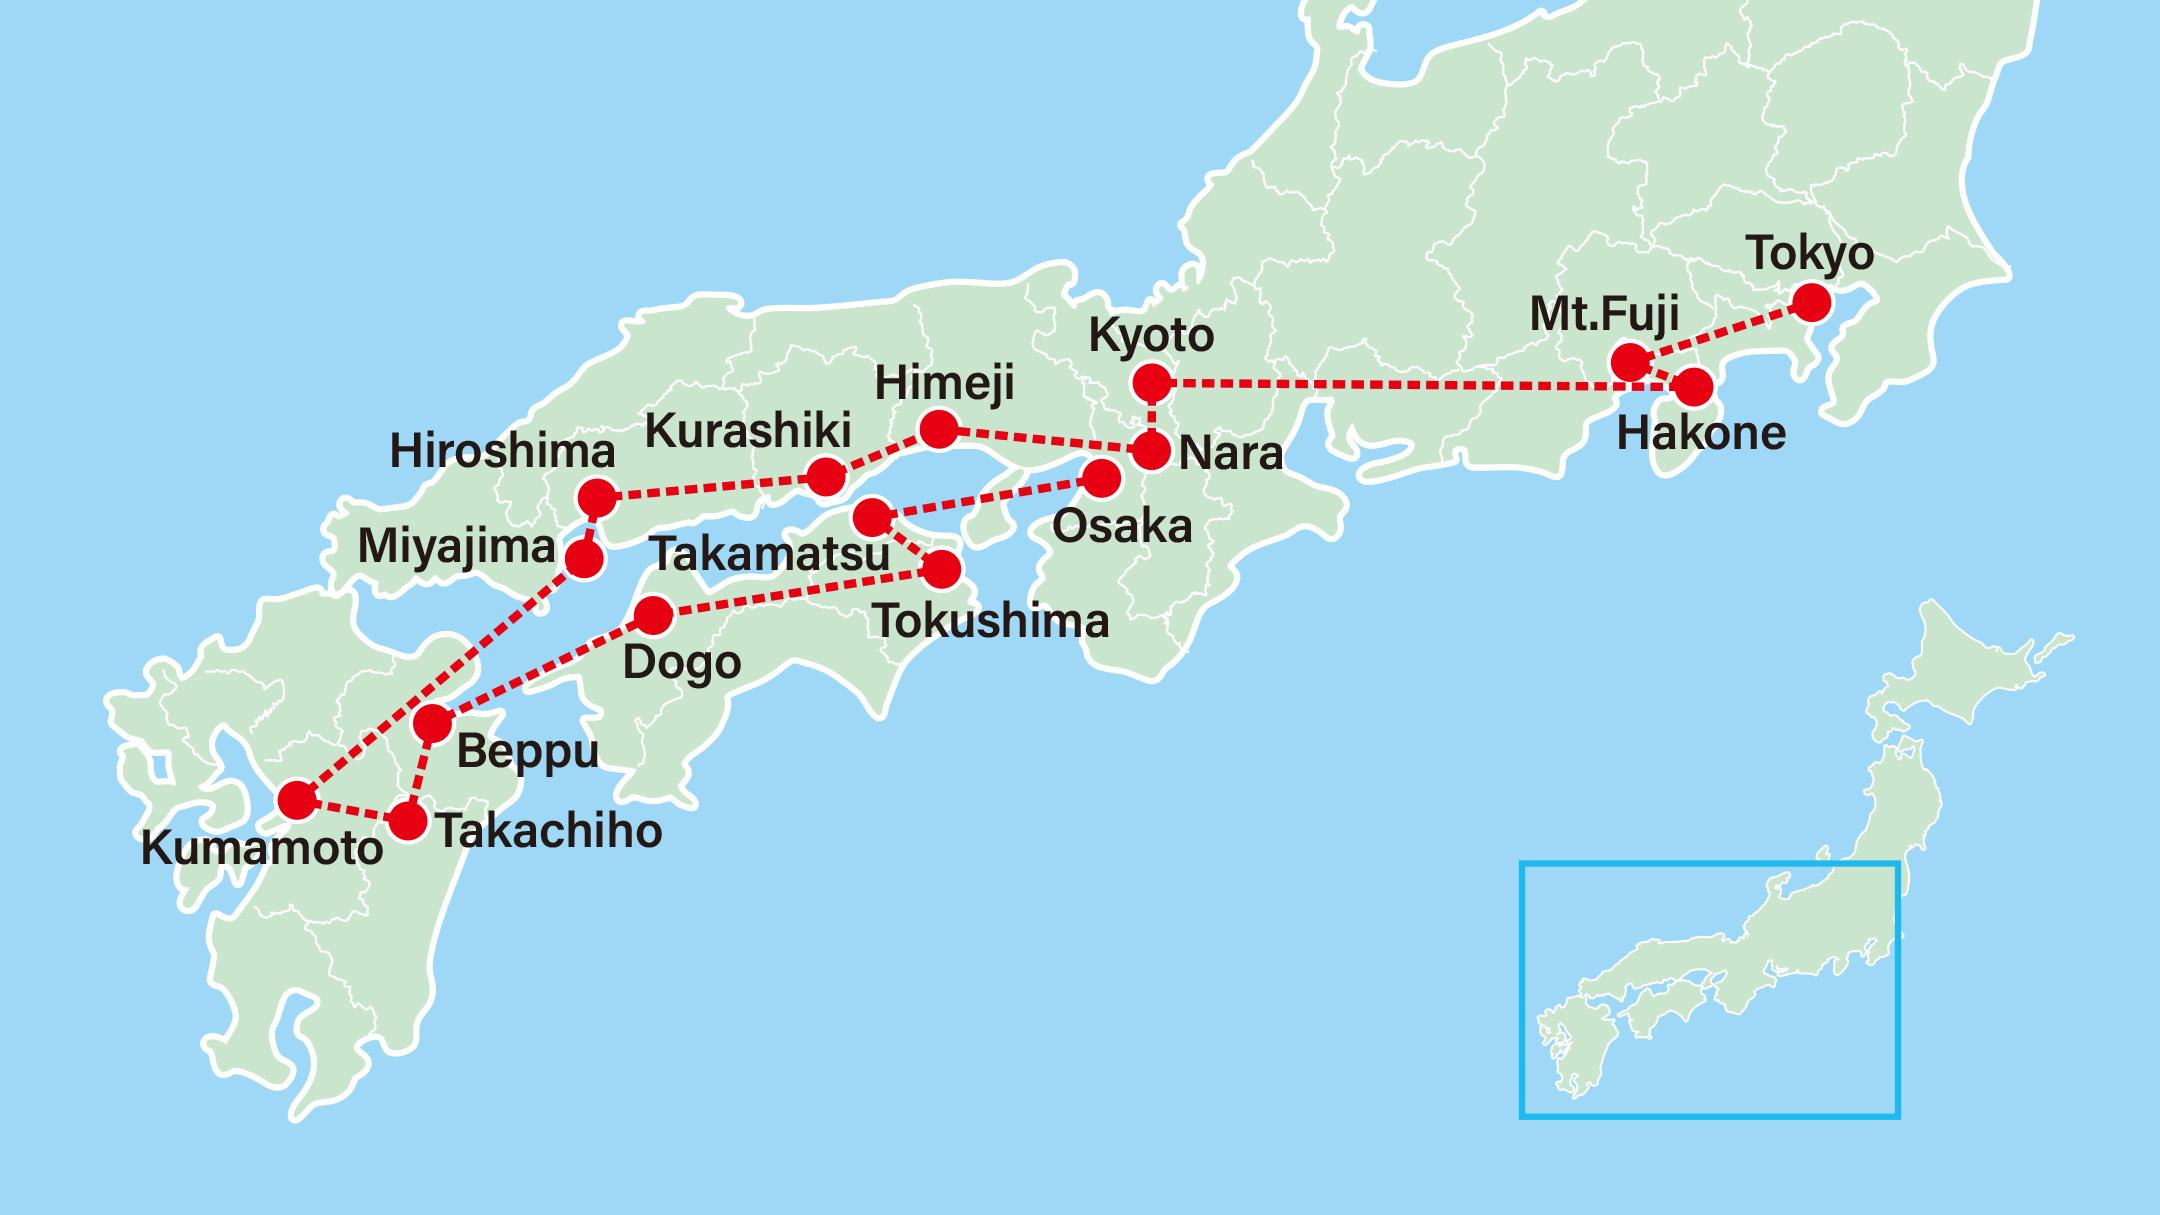 Anime Japan EXPO 2022 15 Days-Tokyo-Mt. Fuji-Hakone-Kyoto-Nara-Himeji-Hiroshima-Miyajima-Nagasaki-Kumamoto-Takachiho-Beppu-Dogo-Ritsurin Garden-Tokushima-Osaka